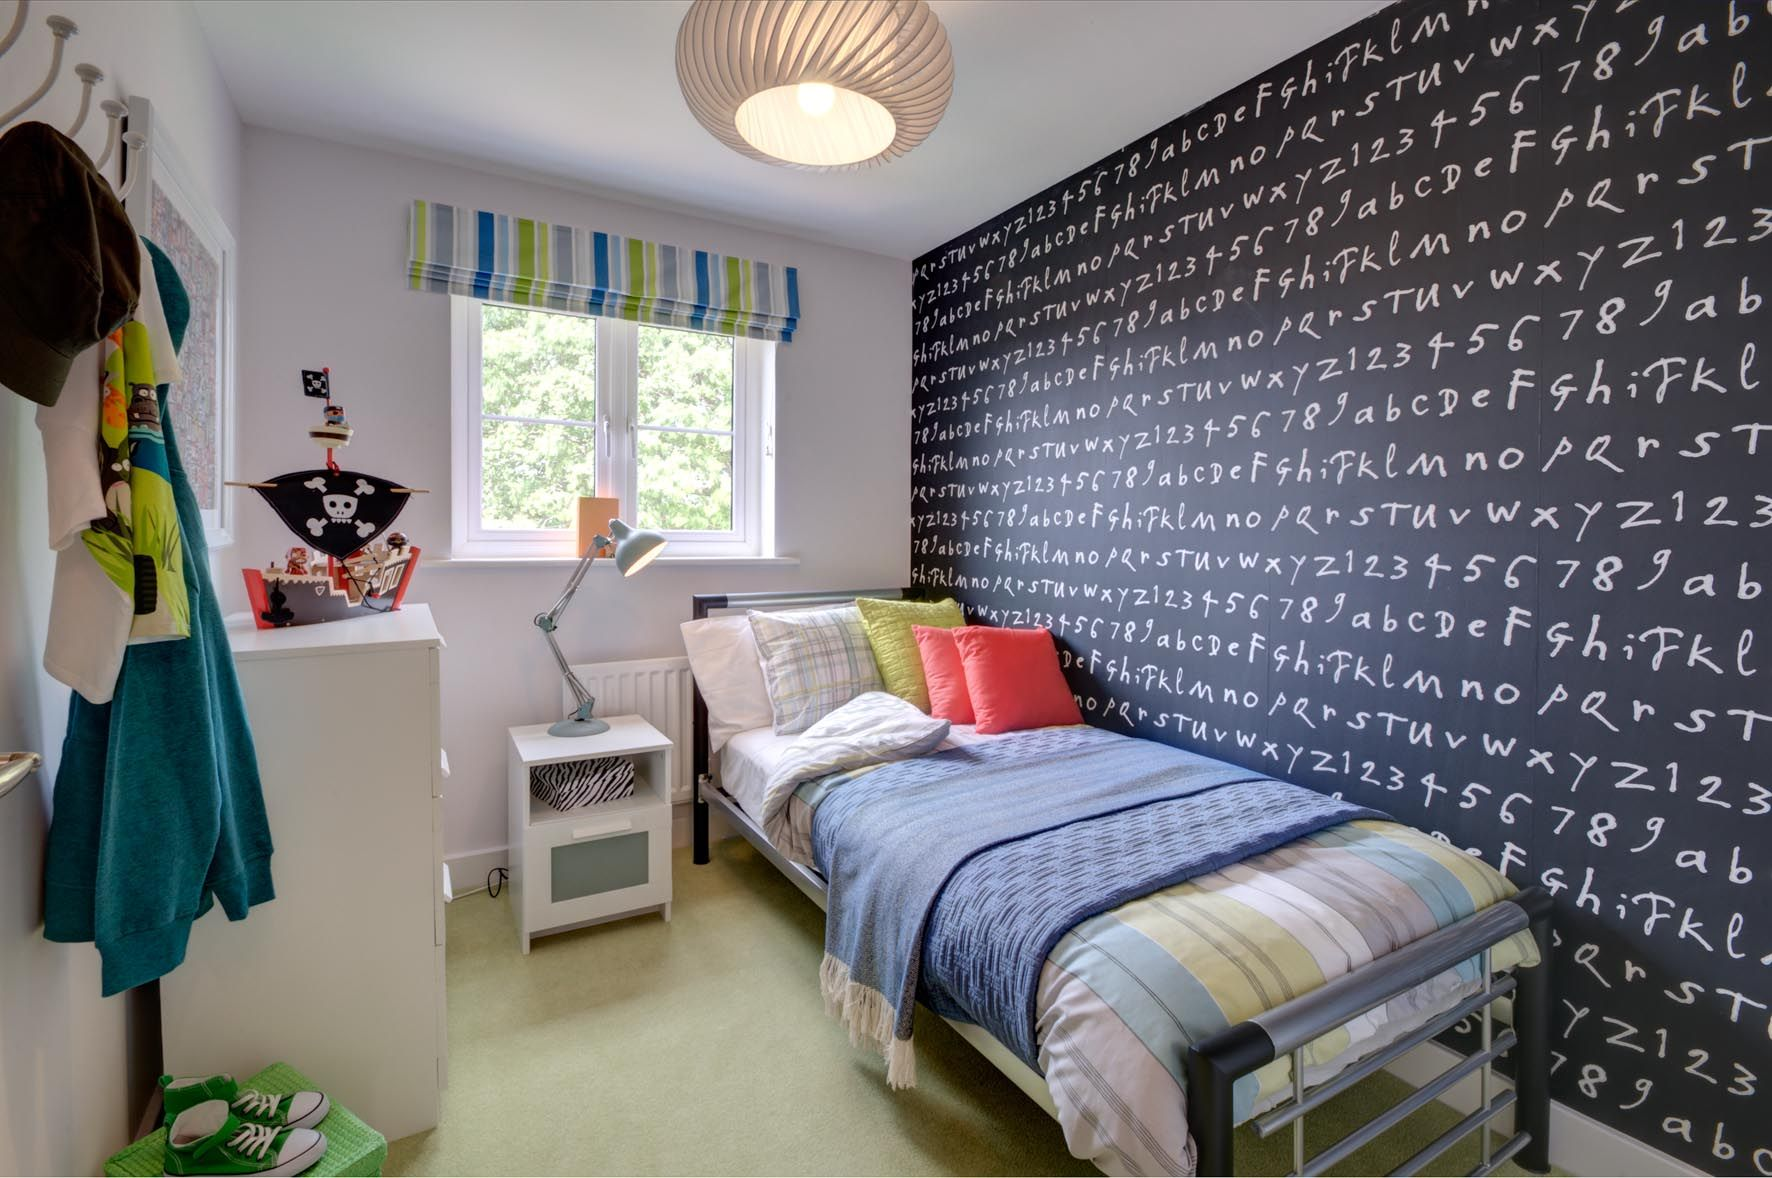 Learn your #alphabet whilst you #sleep at #Highbrookpark #Bristol  http://www.crestnicholson.com/highbrookpark/